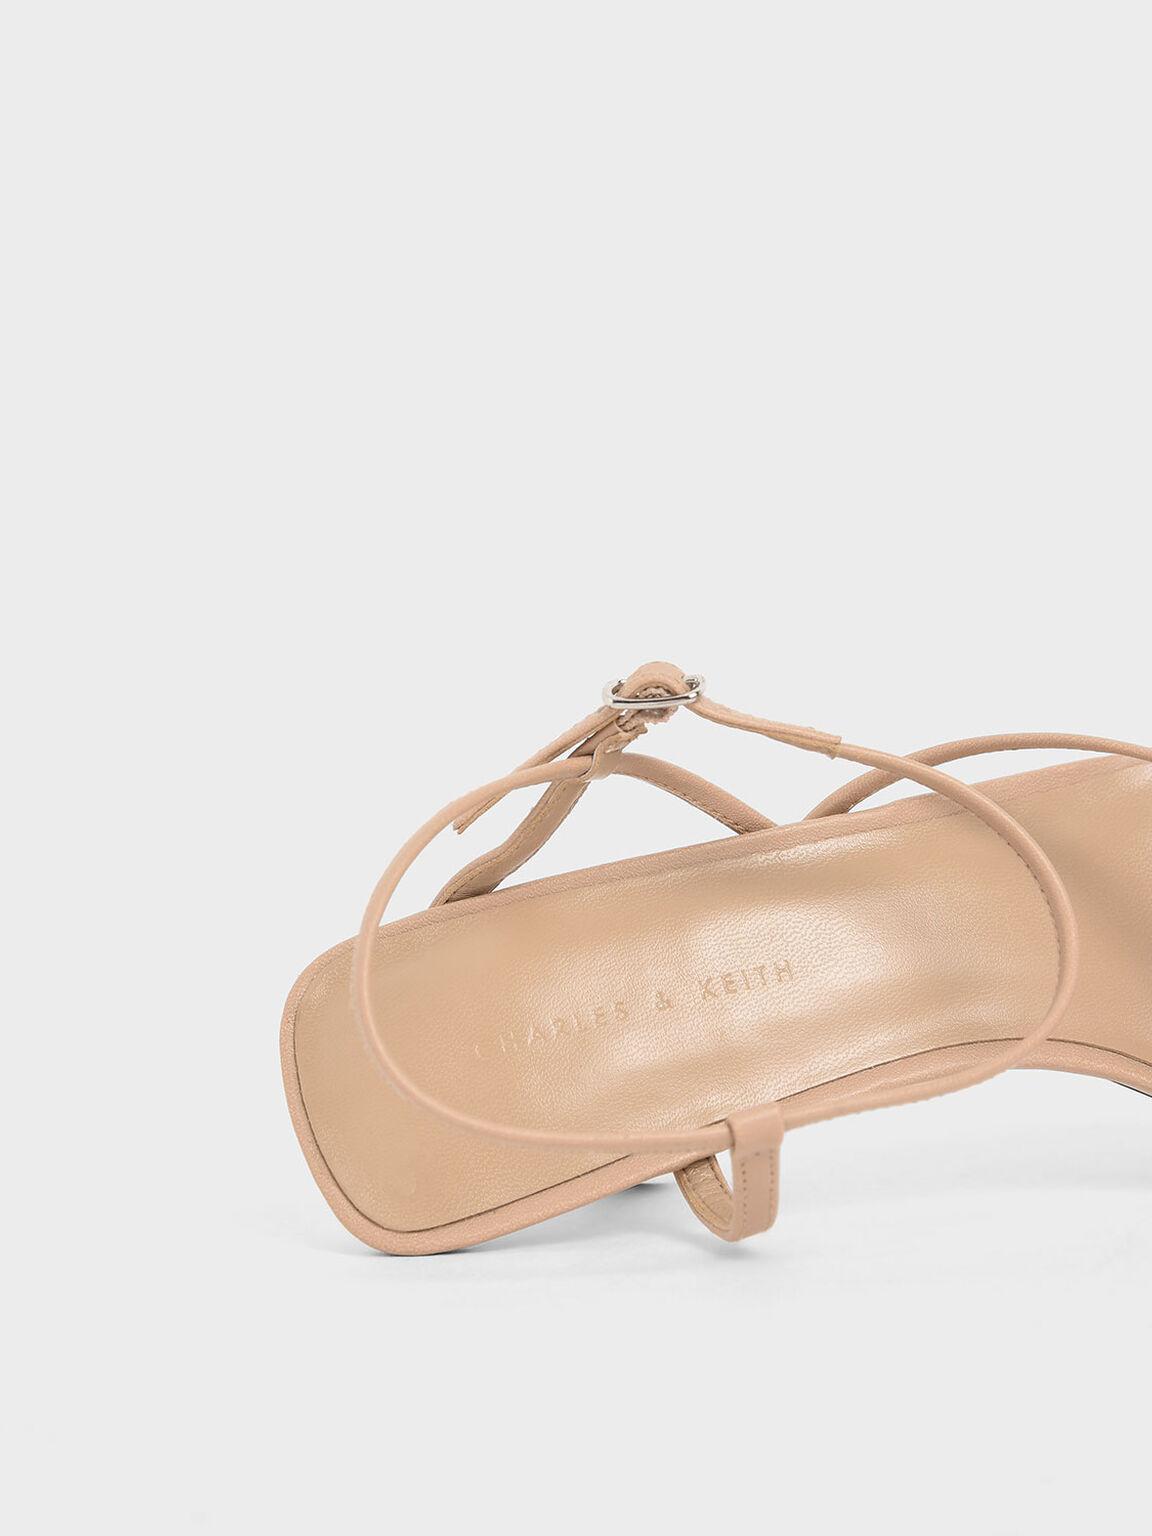 Strappy Sculptural Heel Sandals, Nude, hi-res